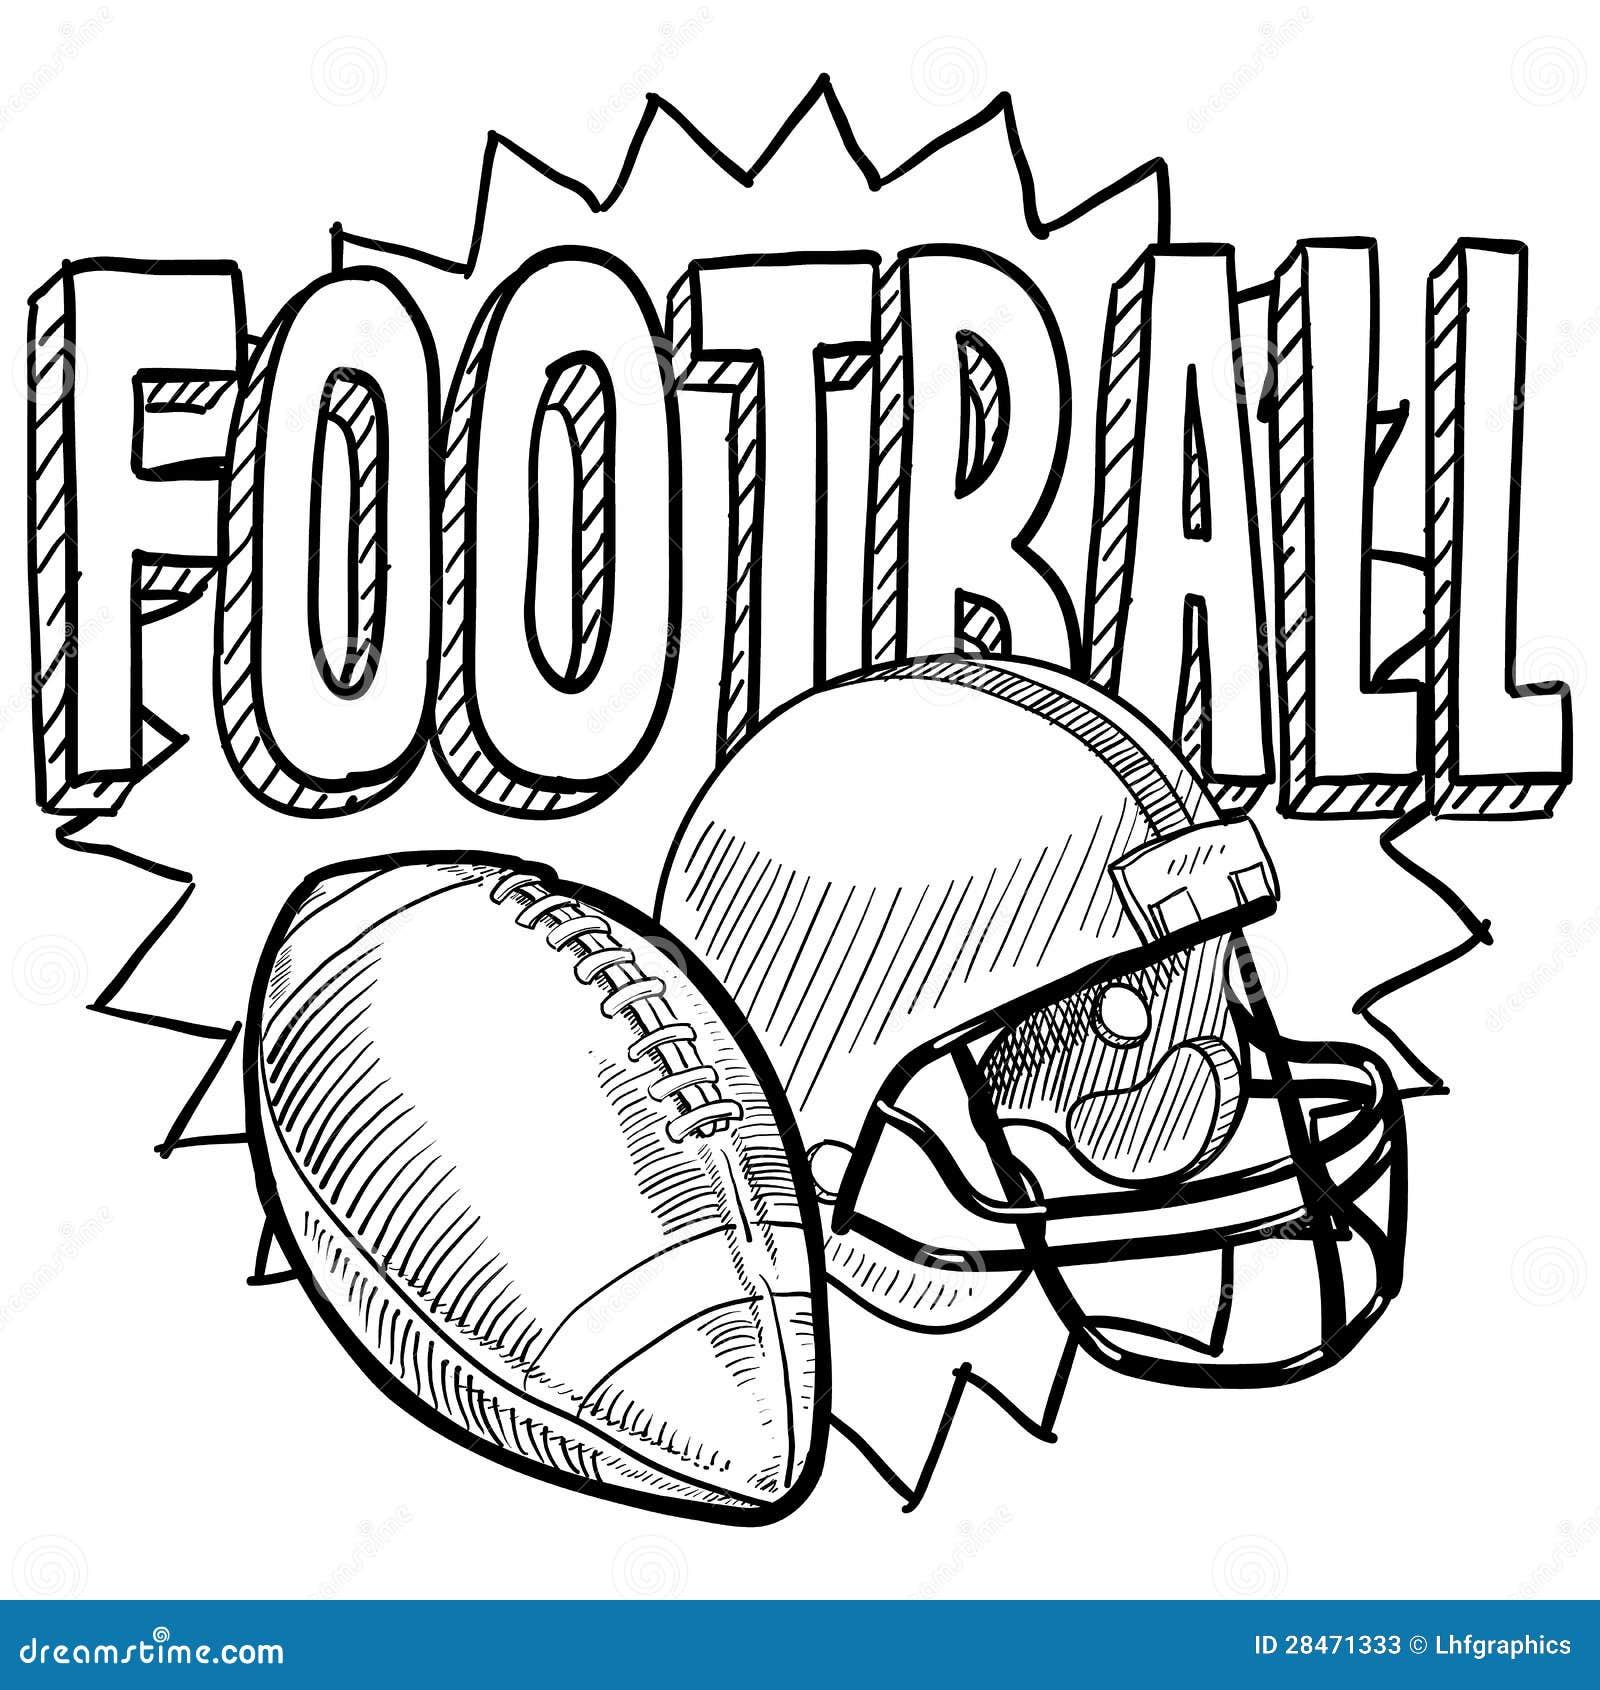 American Football Sketch Stock Vector Illustration Of